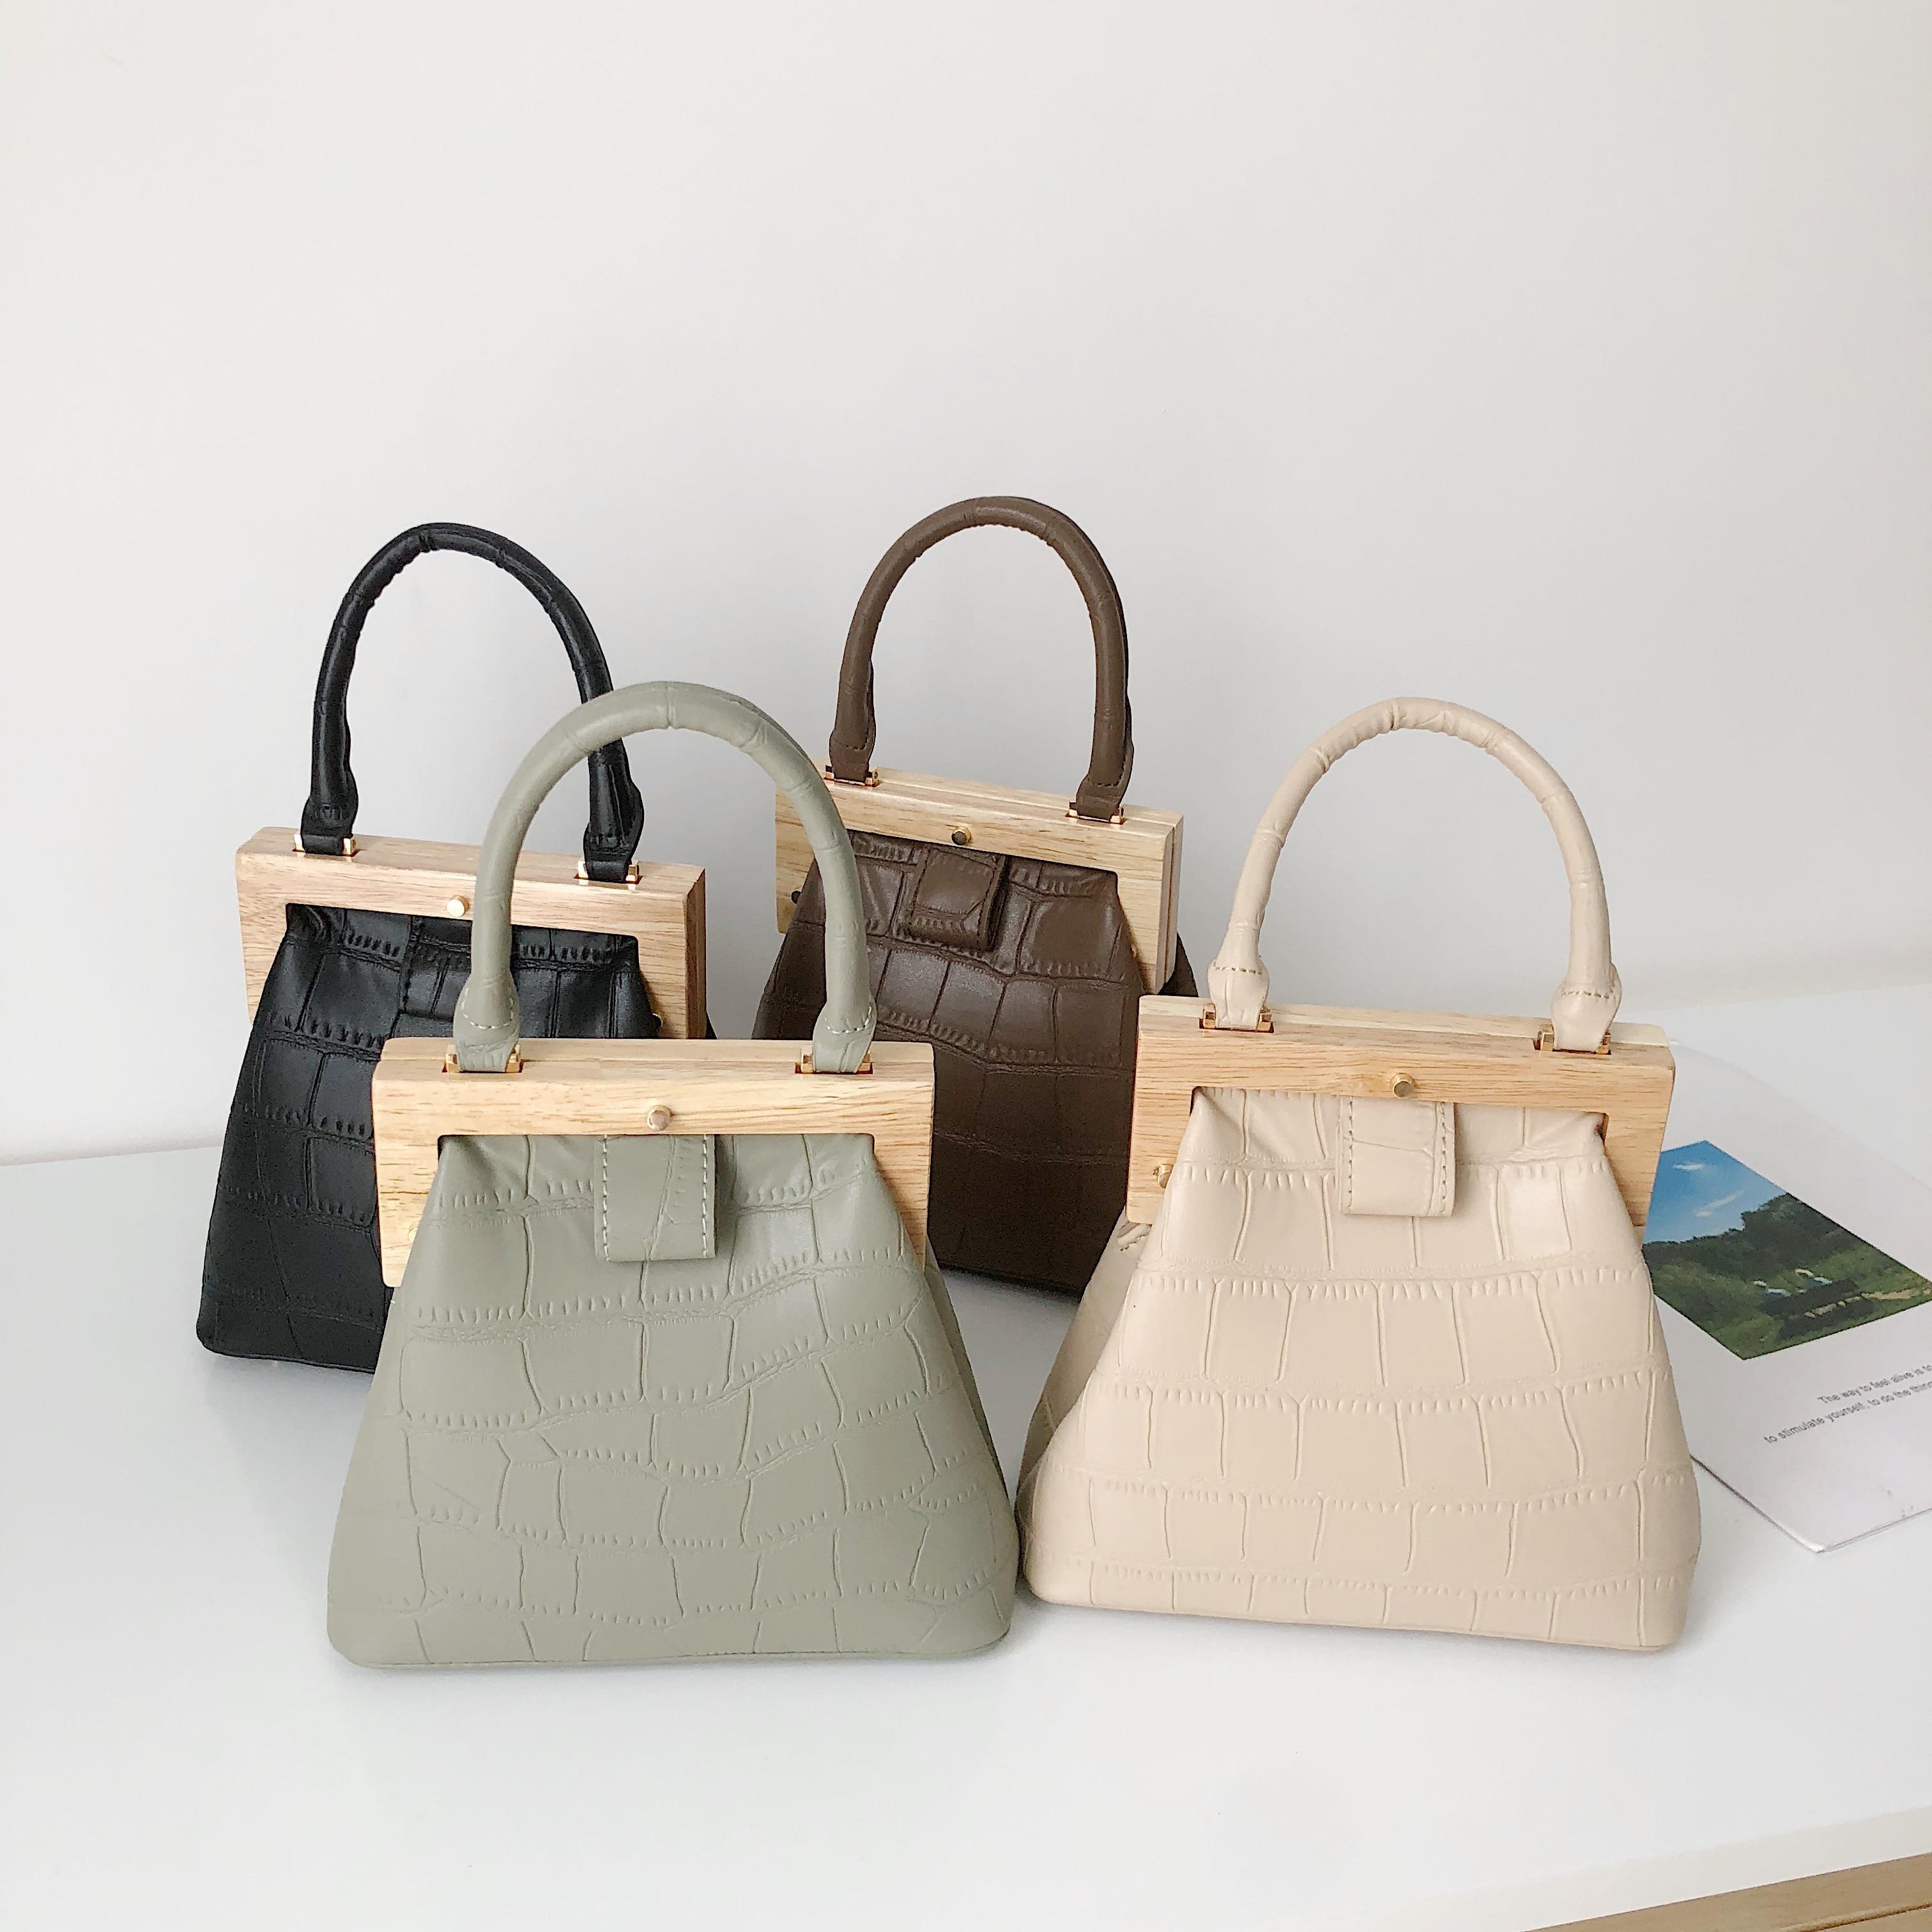 Vintage Wooden Clip Women Handbags Designer Shell Shoulder Bags Luxury Alligator Pu Leather Crossbody Bag Lady Small Purses 2020